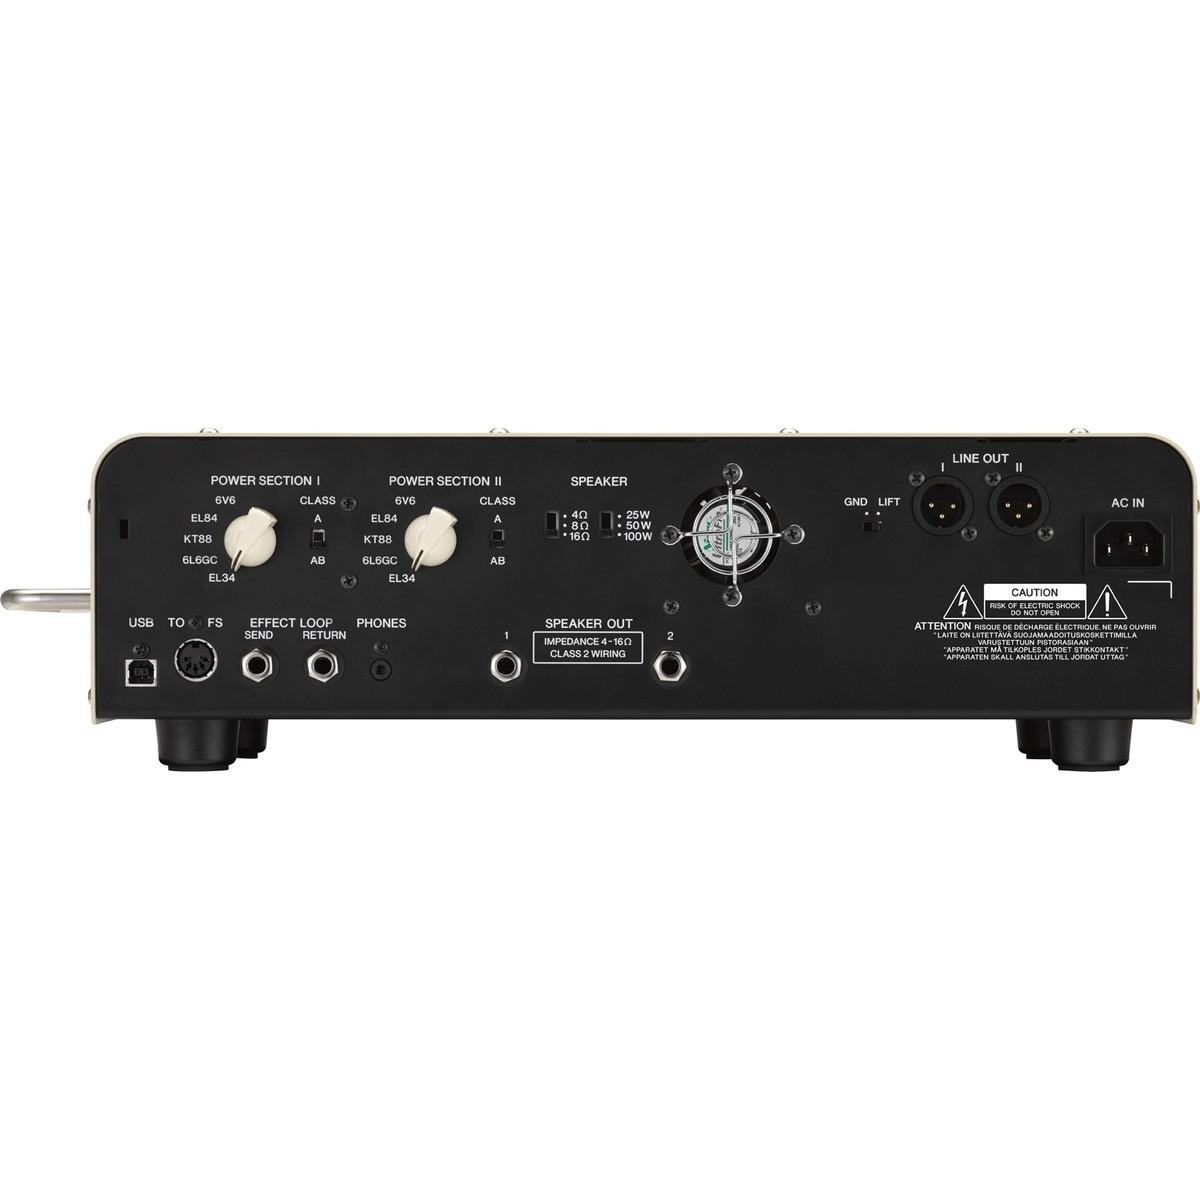 Yamaha thr100hd dual amp head at for Yamaha bass guitar amplifier